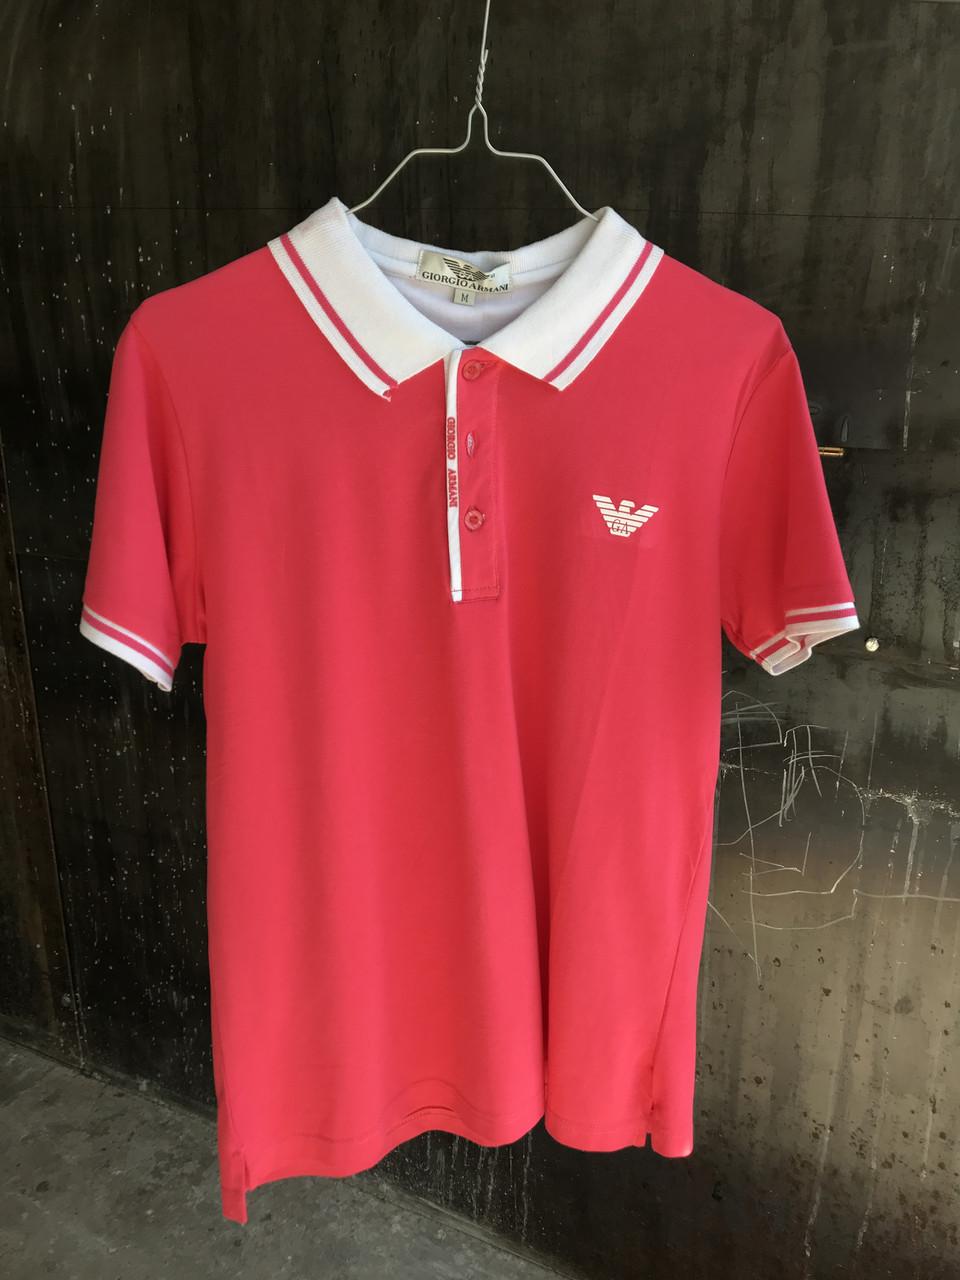 Мужская тениска Giorgio Armani.Розовая